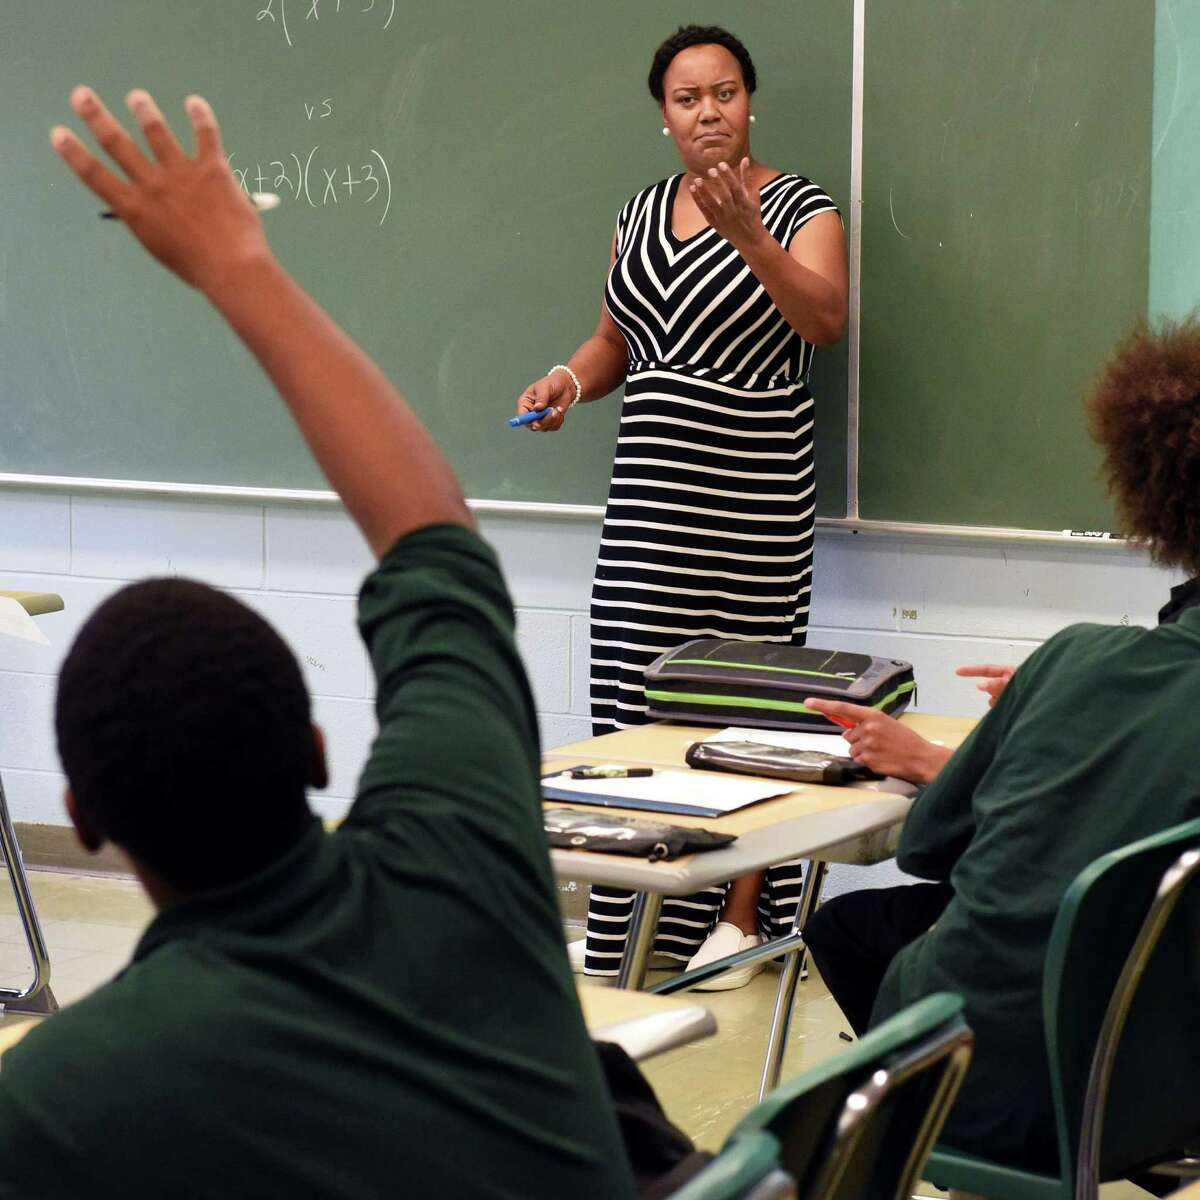 Green Tech High Charter School math teacher Barbara Fiddemon calls on a student during class Thursday Oct. 20, 2016 in Albany, NY. (John Carl D'Annibale / Times Union)